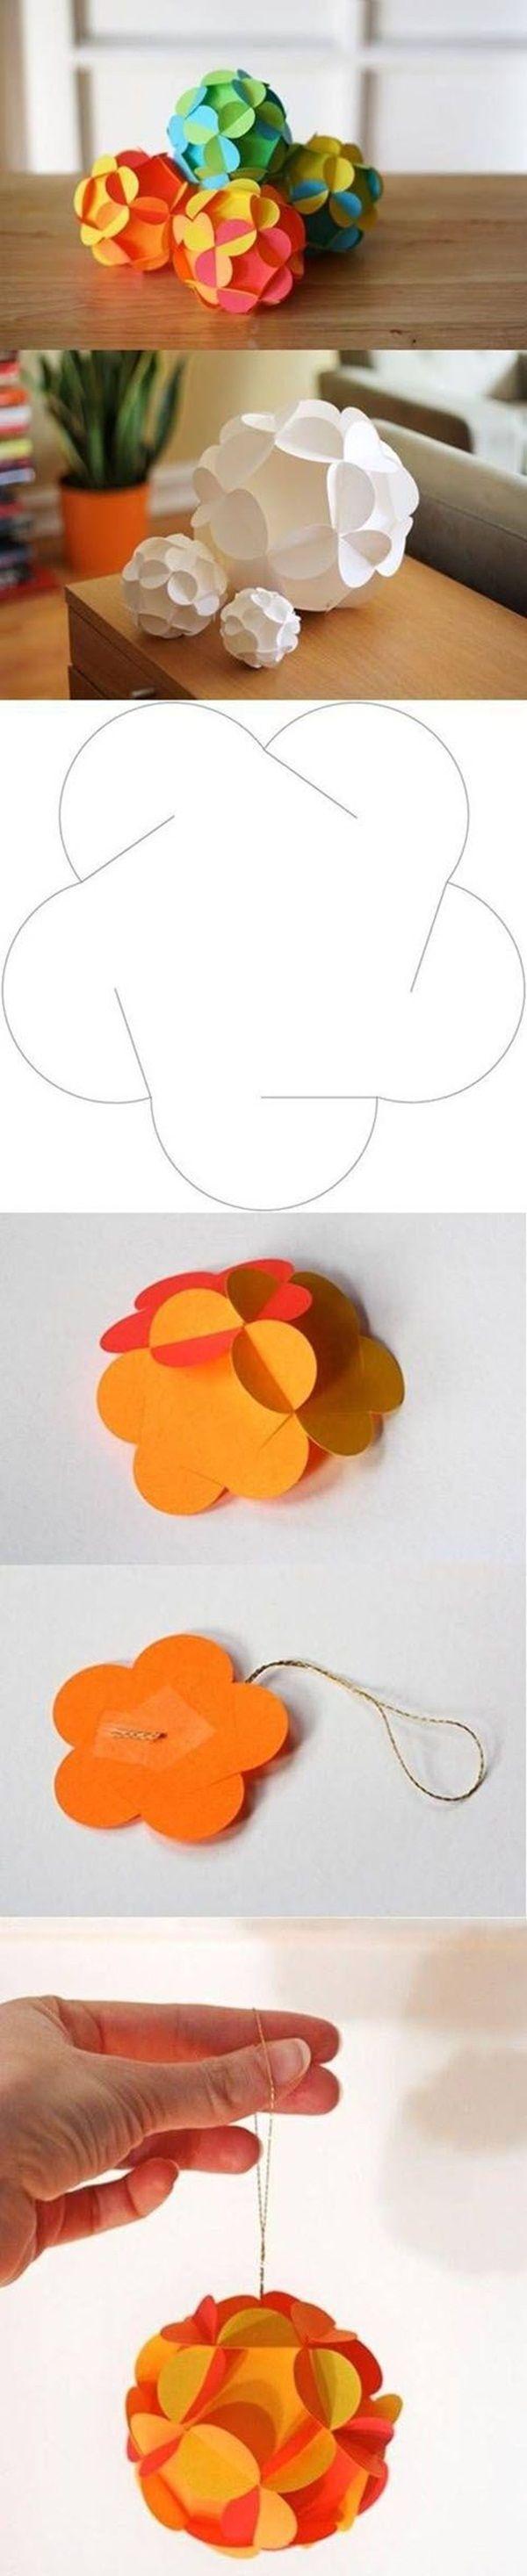 Paper Craft Ideas5